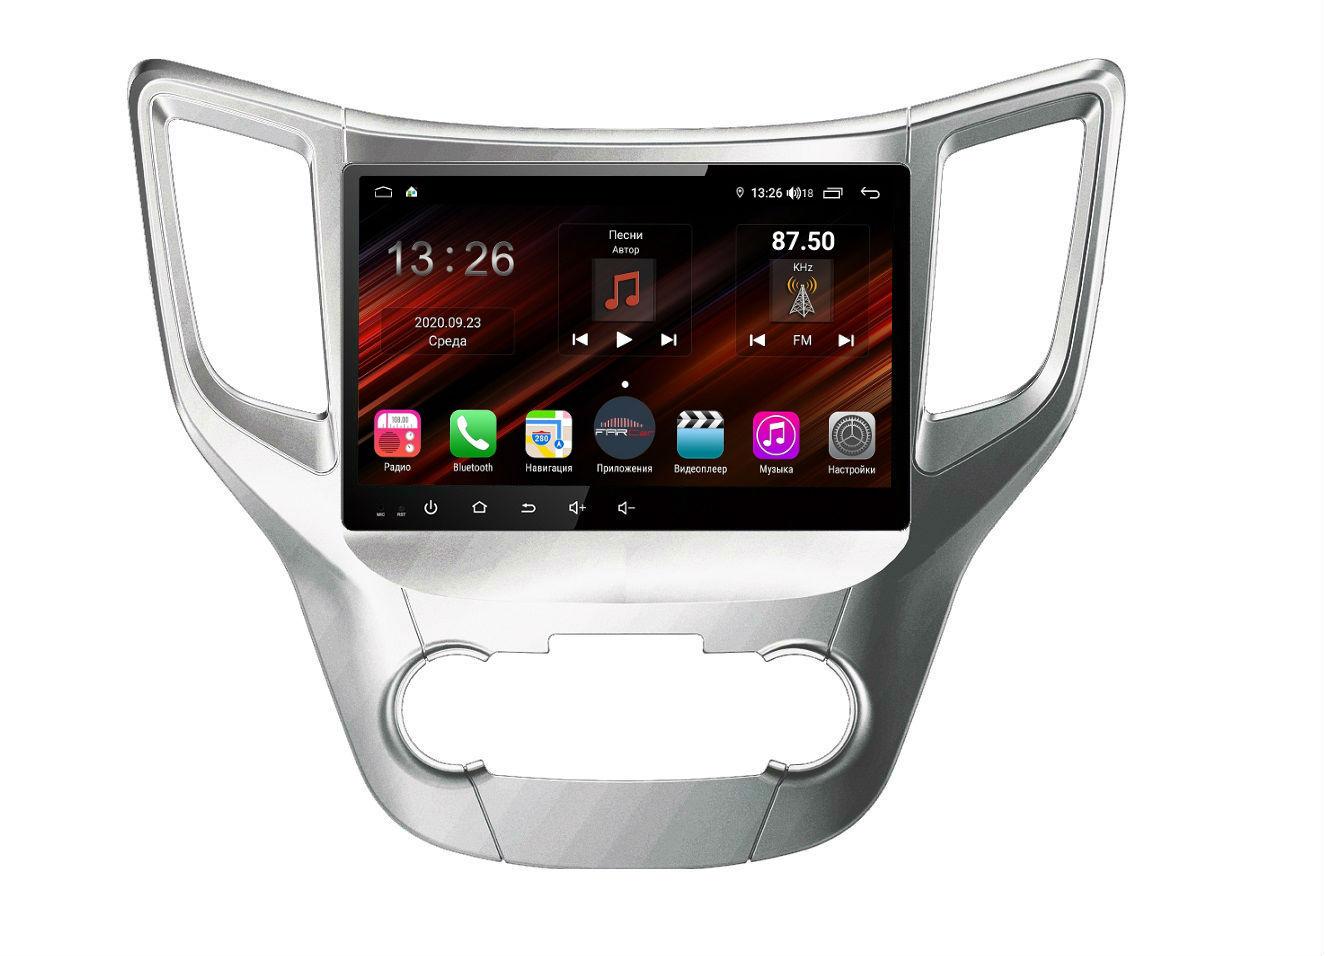 Штатная магнитола FarCar s400 Super HD для Changan на Android (XH1003R) (+ Камера заднего вида в подарок!)